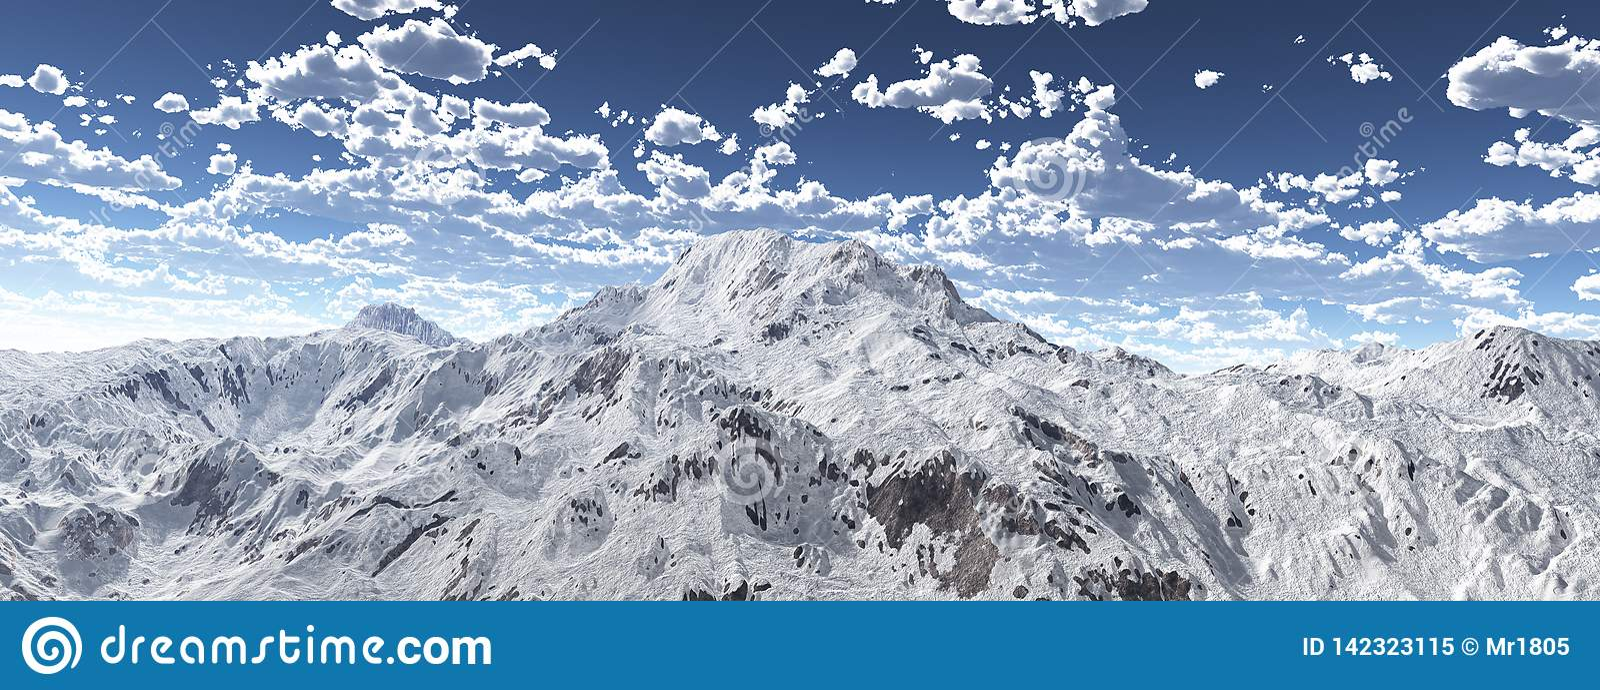 Panorama da montanha com um c?u nebuloso